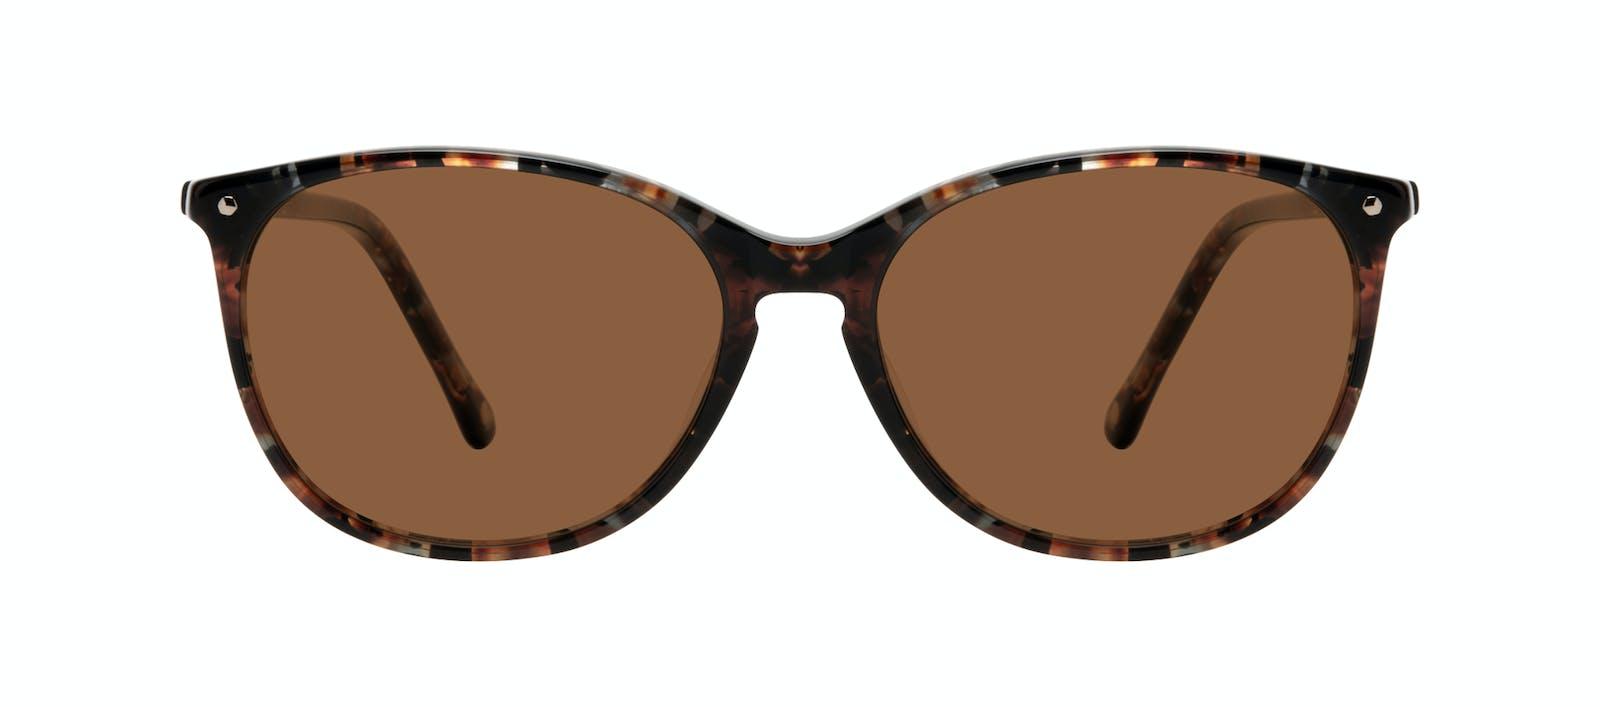 9dbe51b5f96 Affordable Fashion Glasses Rectangle Square Round Sunglasses Women Nadine  Sepia Front